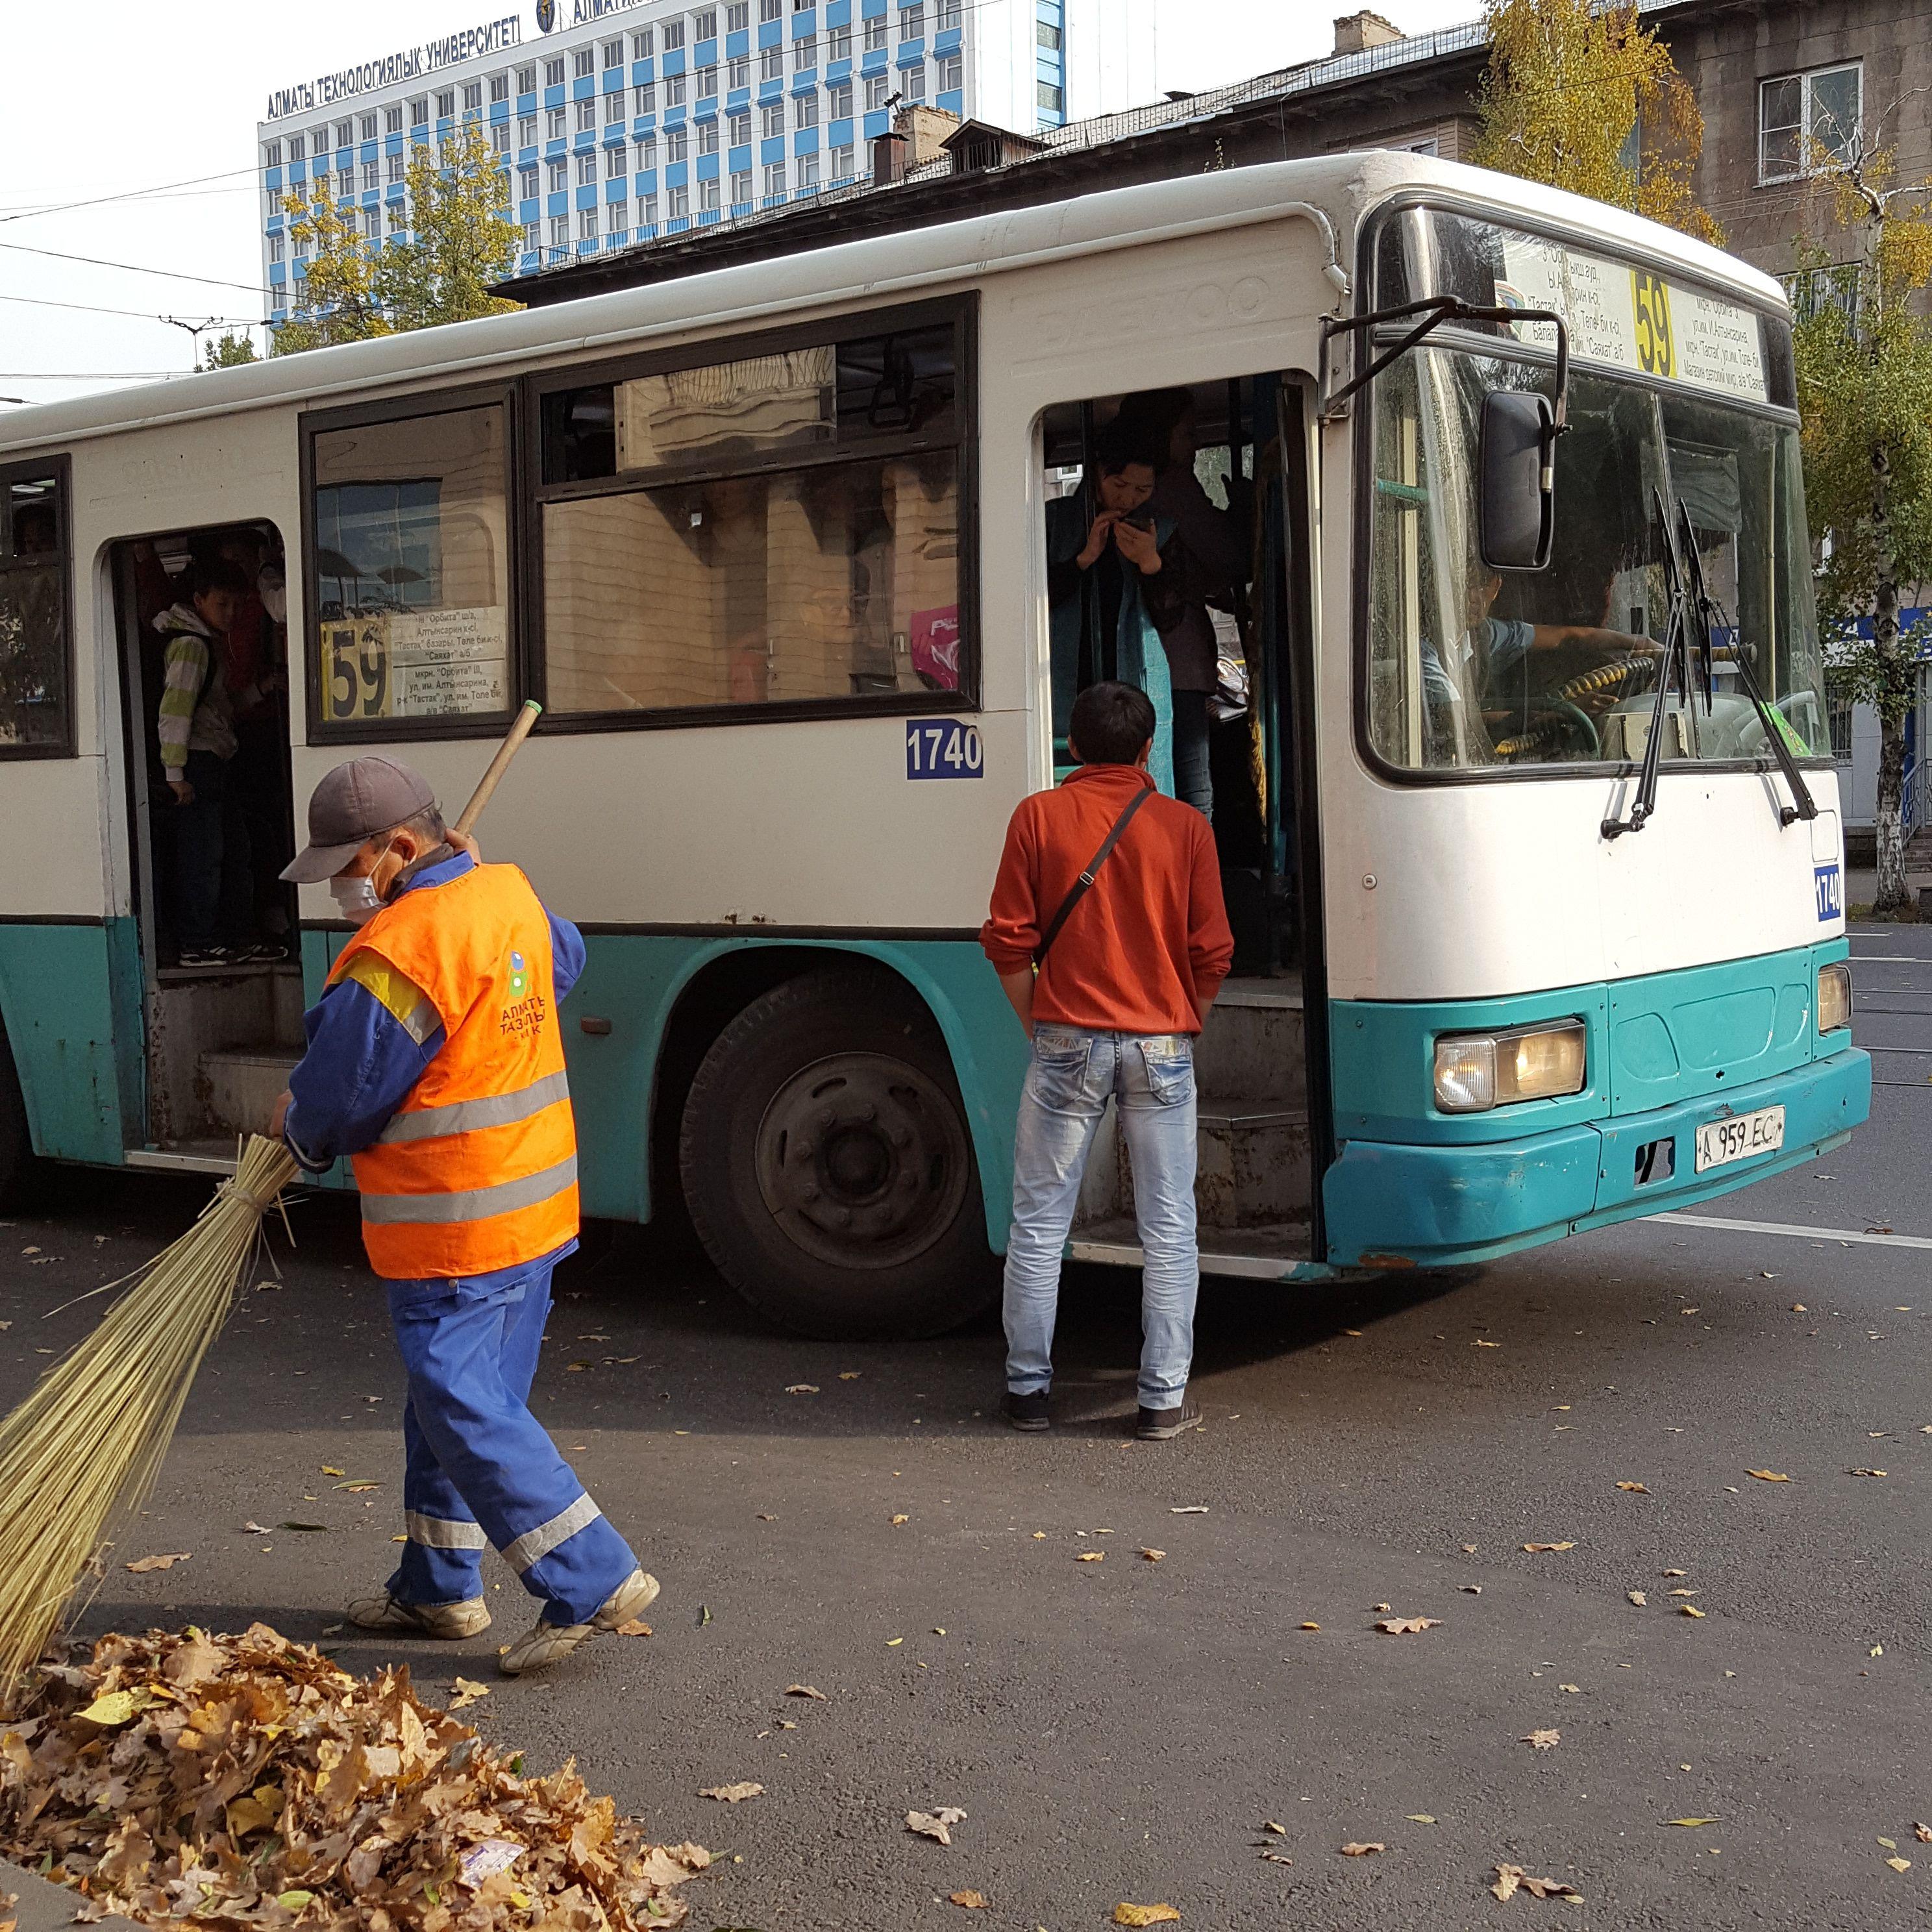 6 Monate in Almaty: endlich angekommen